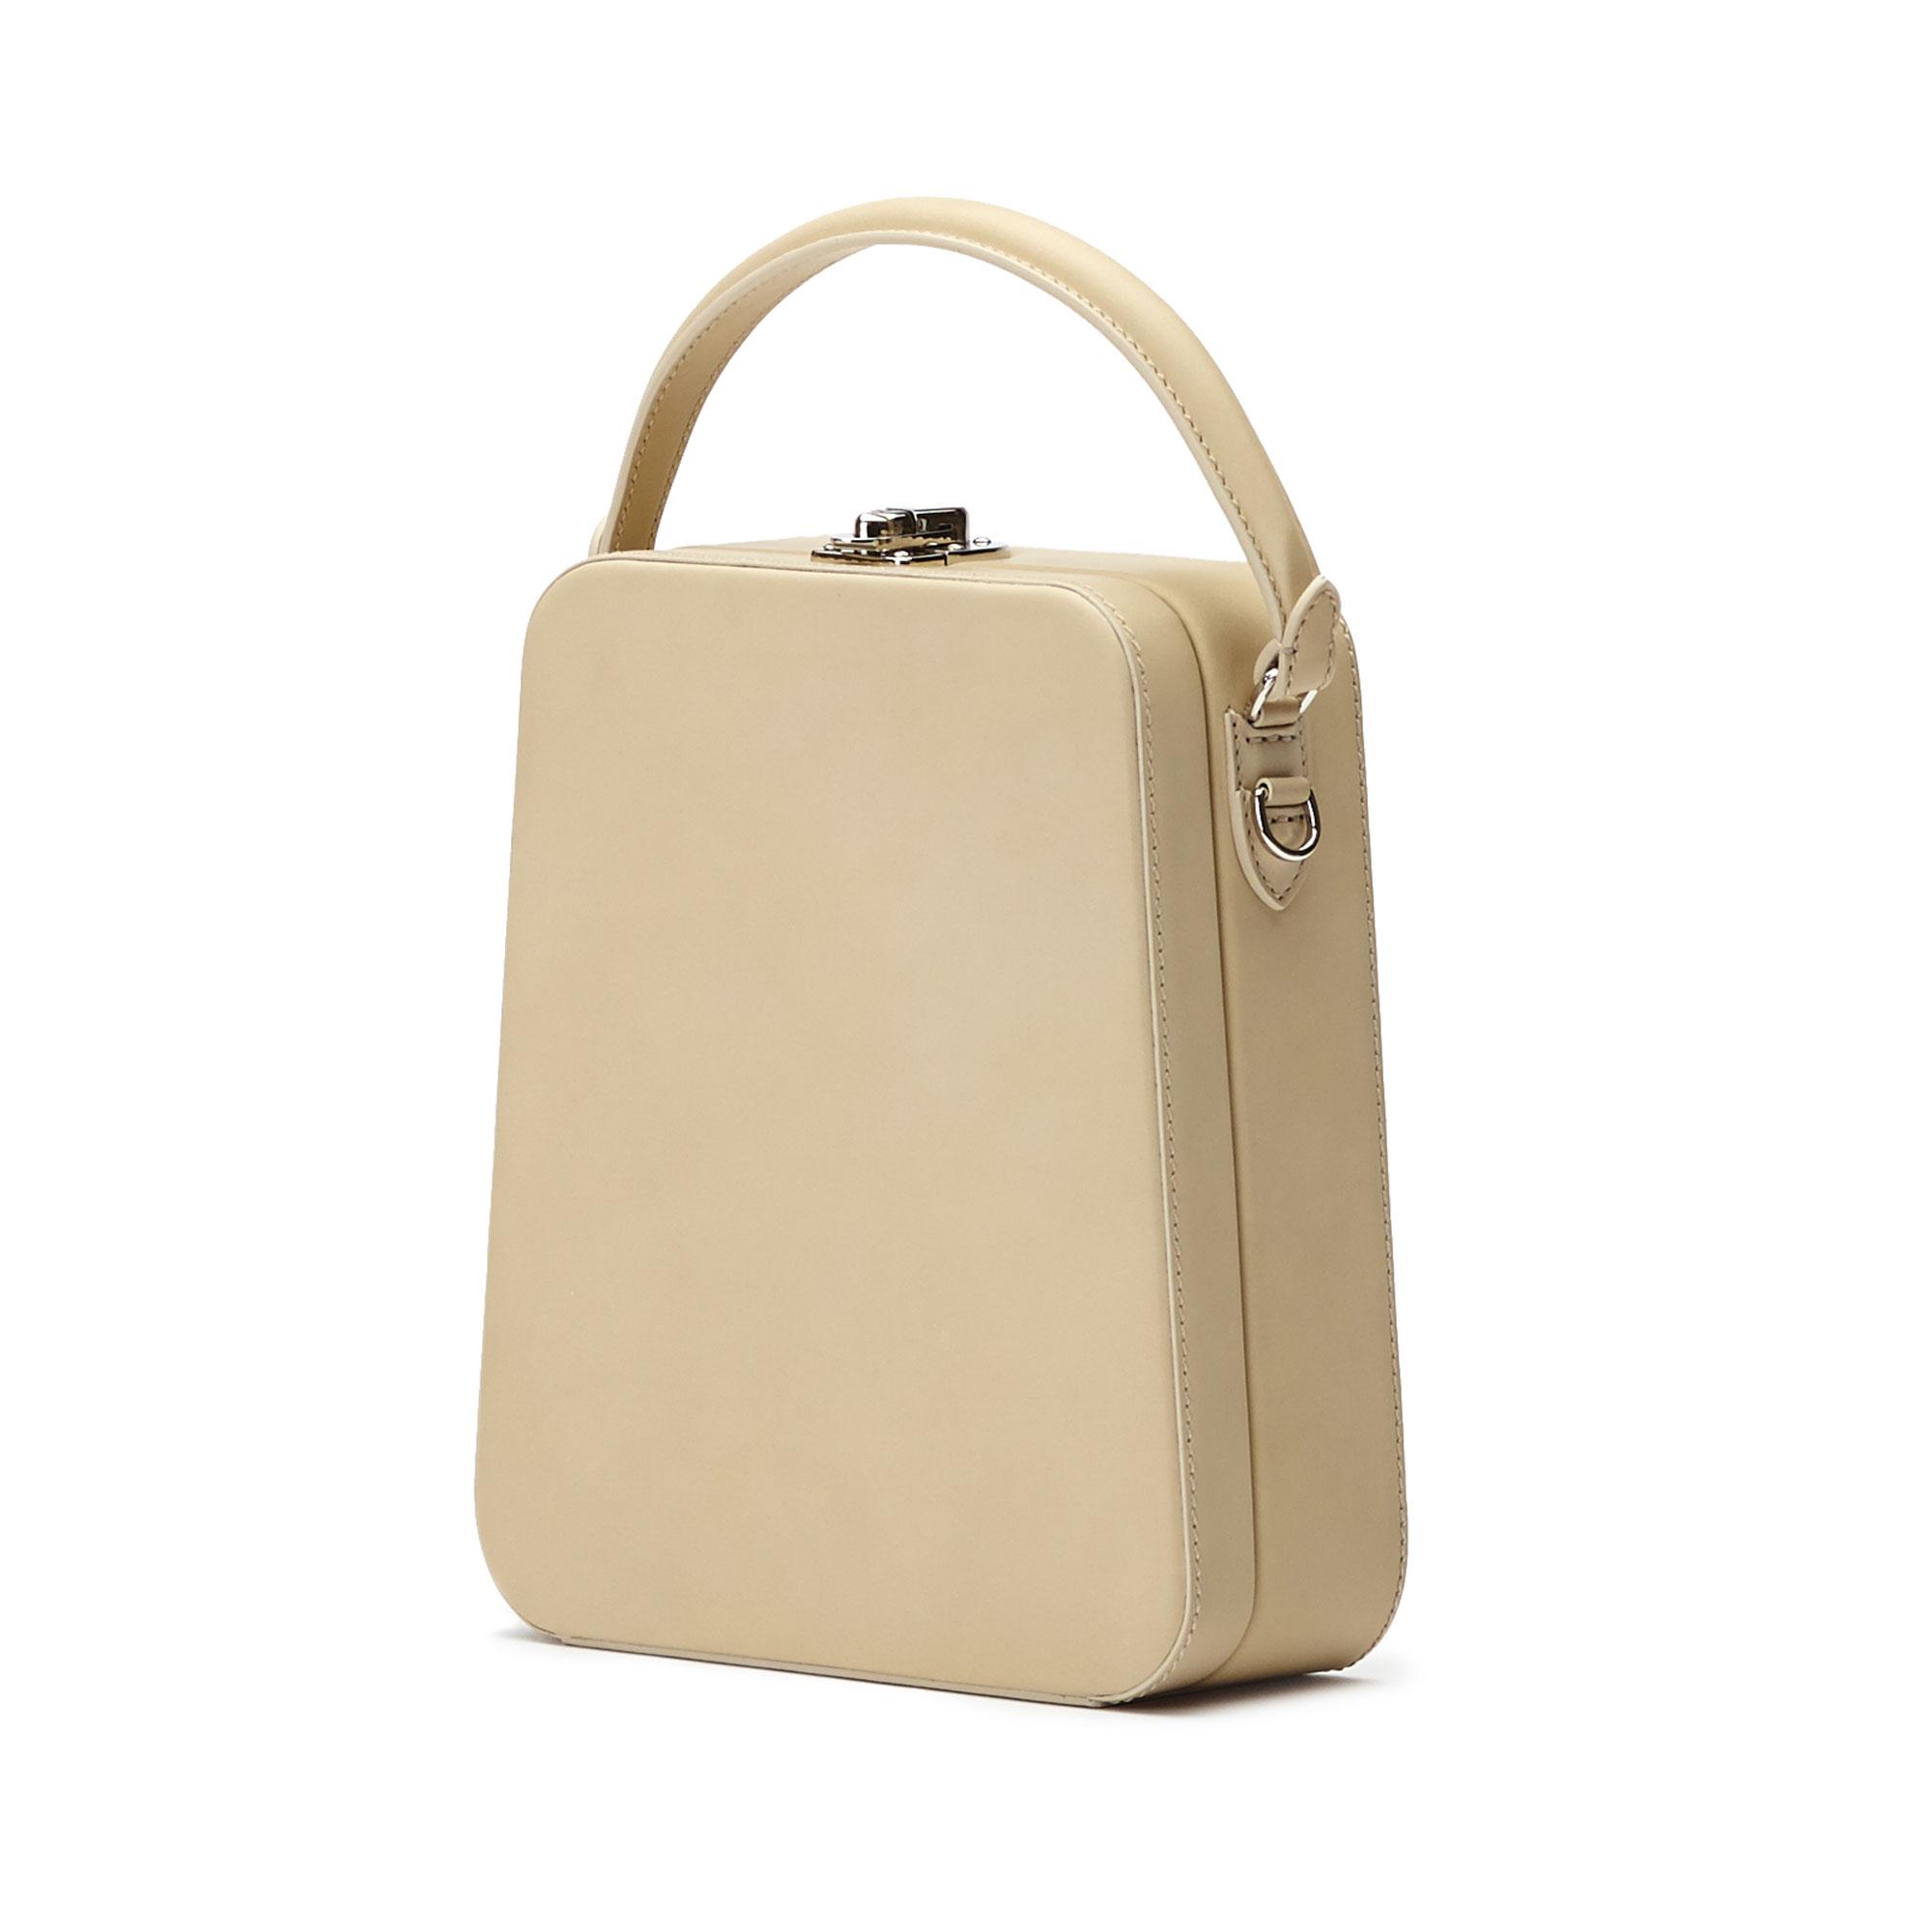 The ivory french calf Tall Bertoncina bag by Bertoni 1949 02